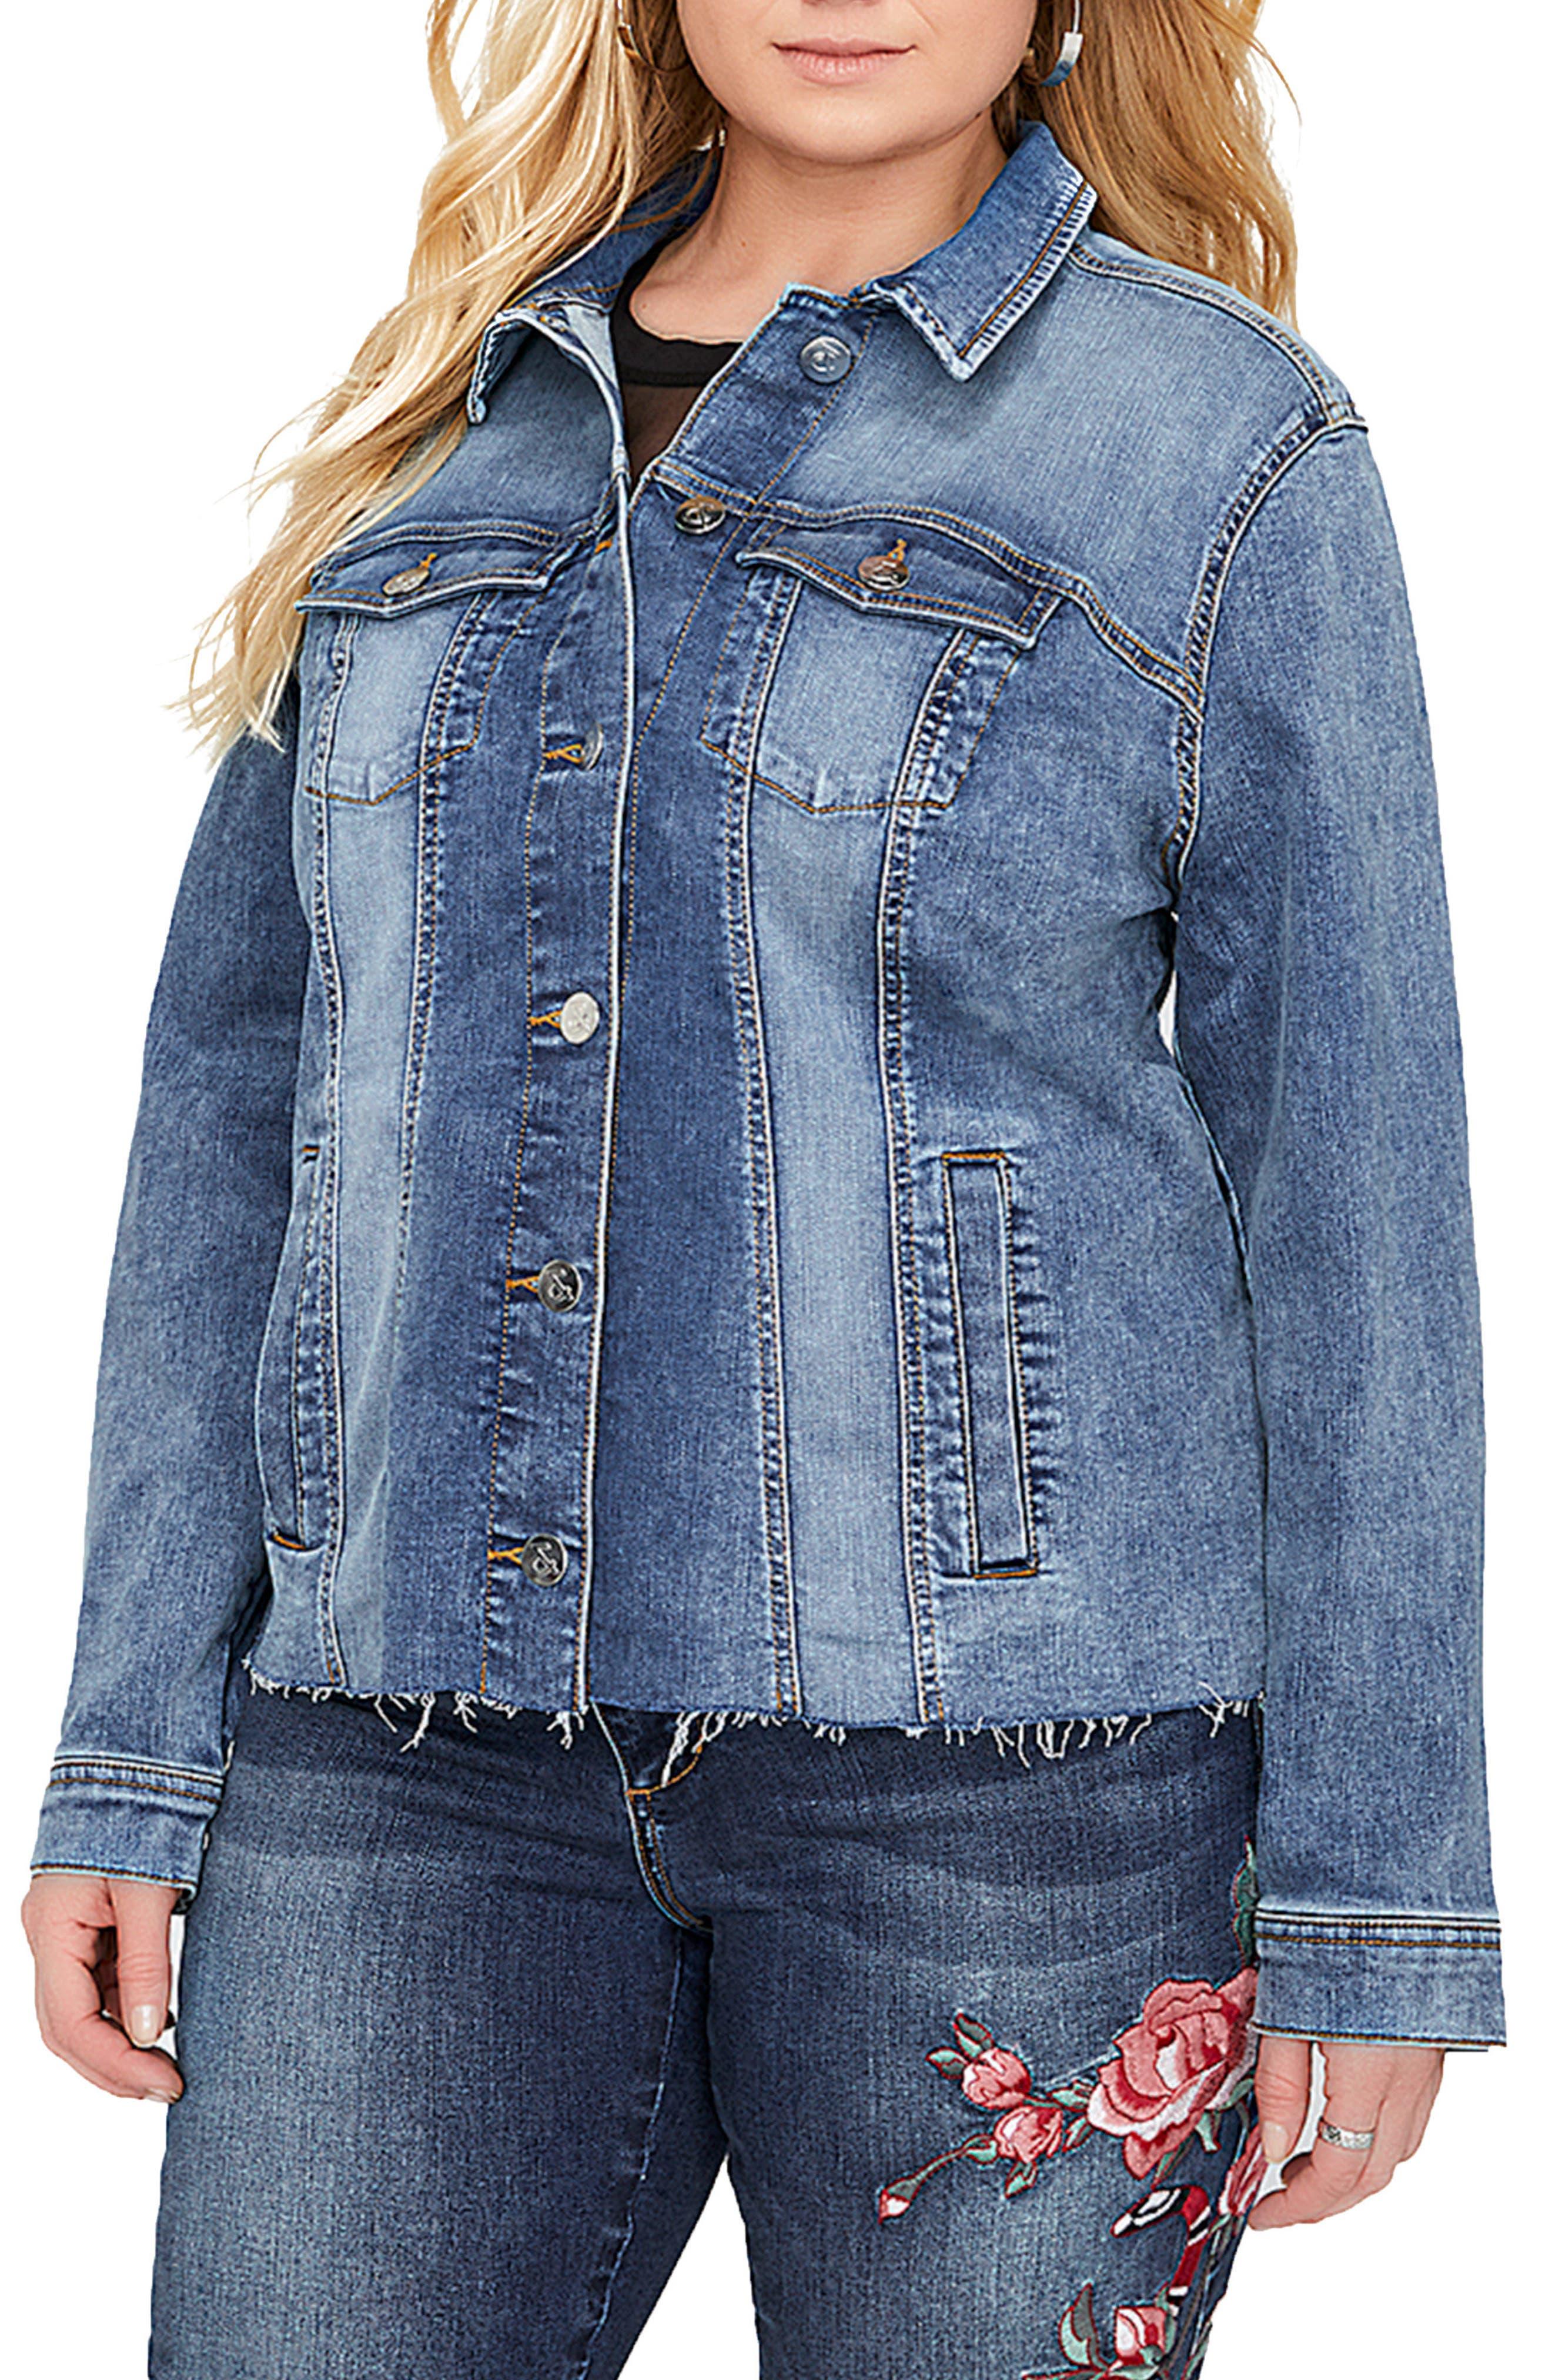 Ruffle Denim Jacket,                         Main,                         color, 461